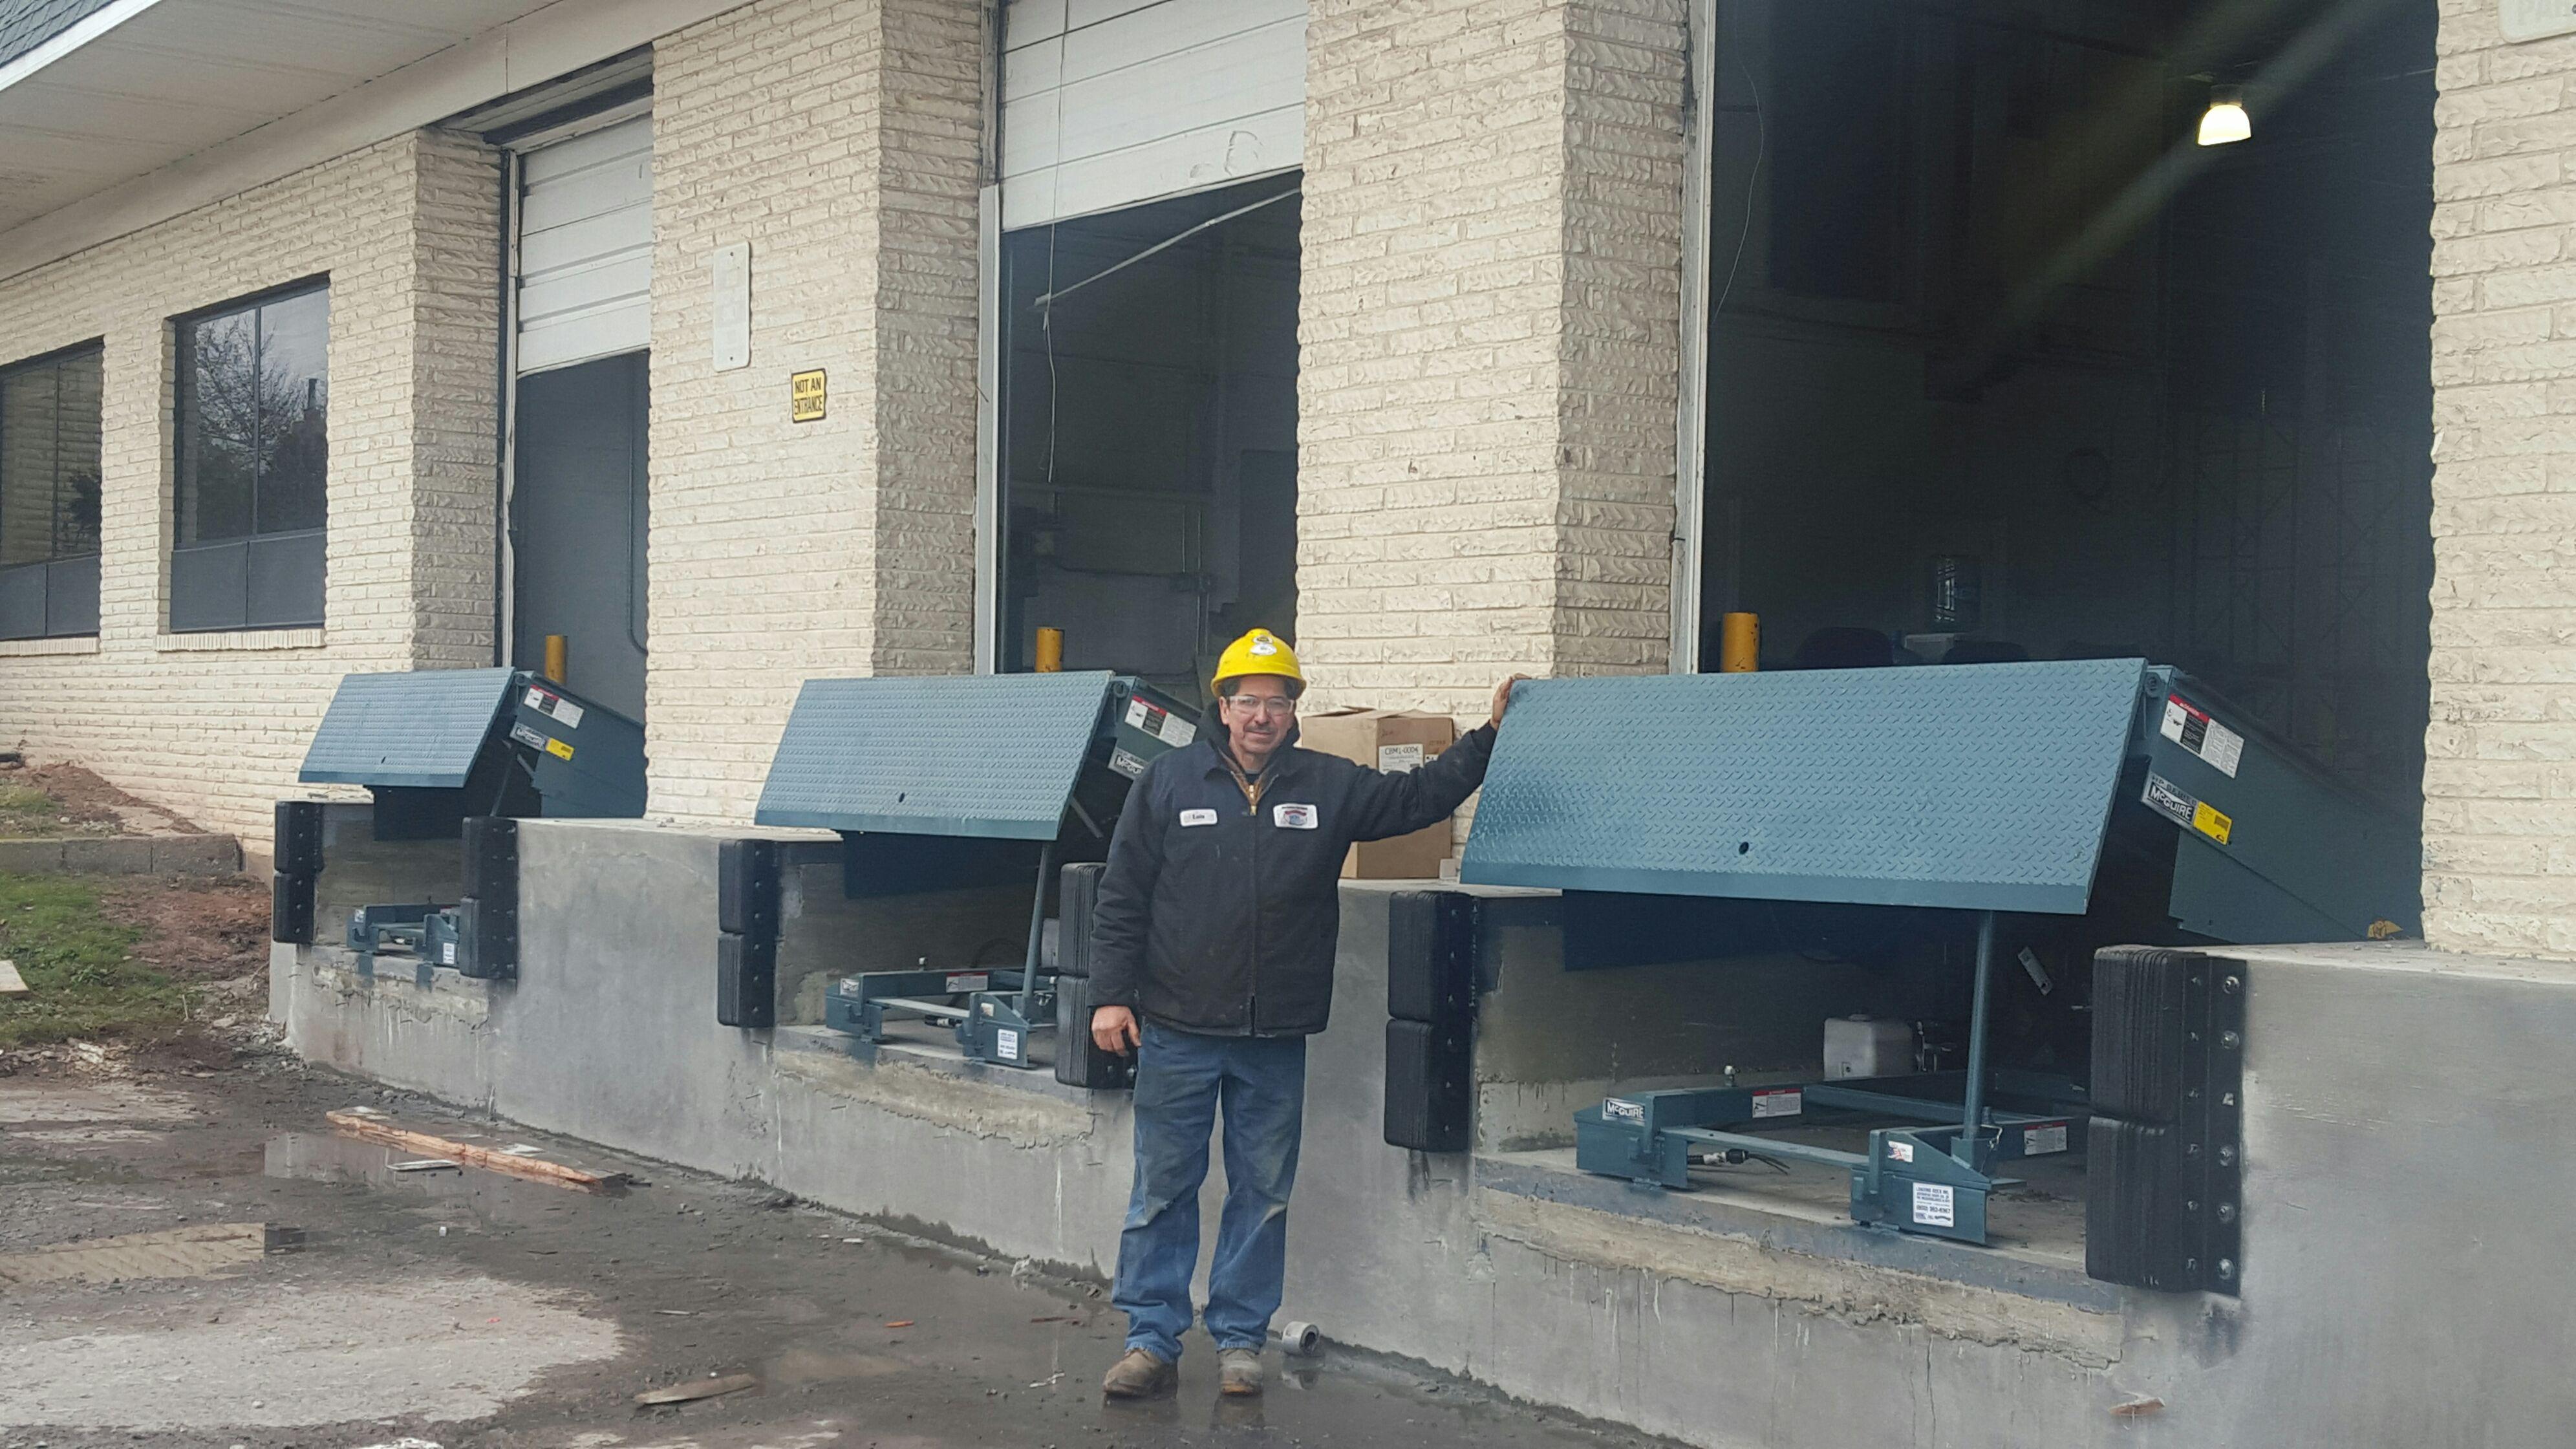 Dock_Plate_Lift_Service_New_Jersey_New_York_City.jpg